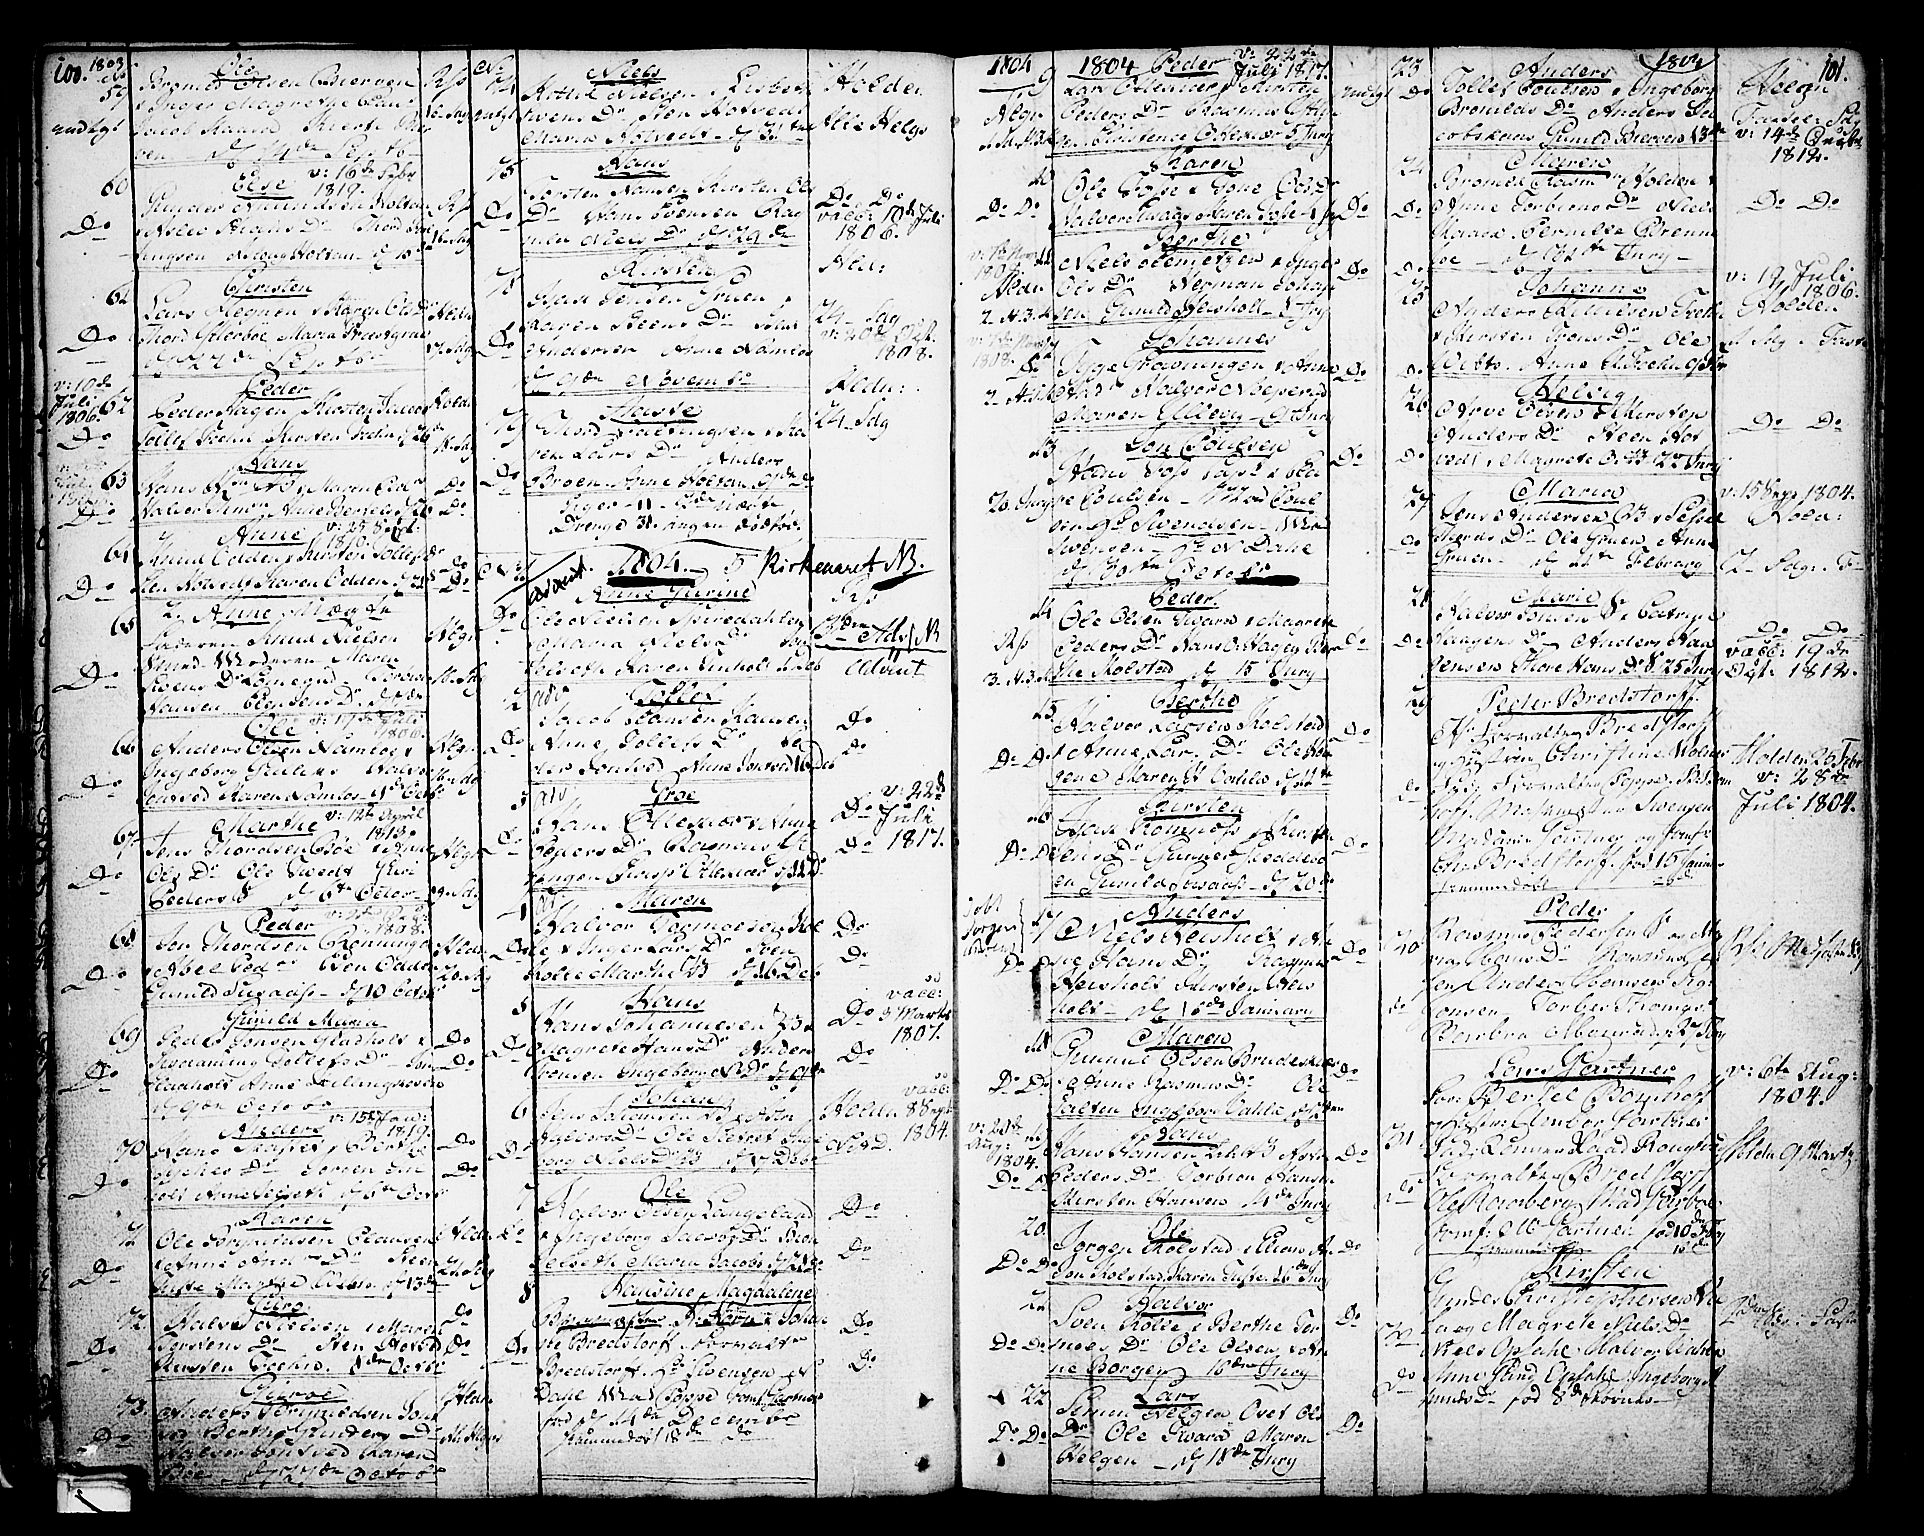 SAKO, Holla kirkebøker, F/Fa/L0002: Ministerialbok nr. 2, 1779-1814, s. 100-101